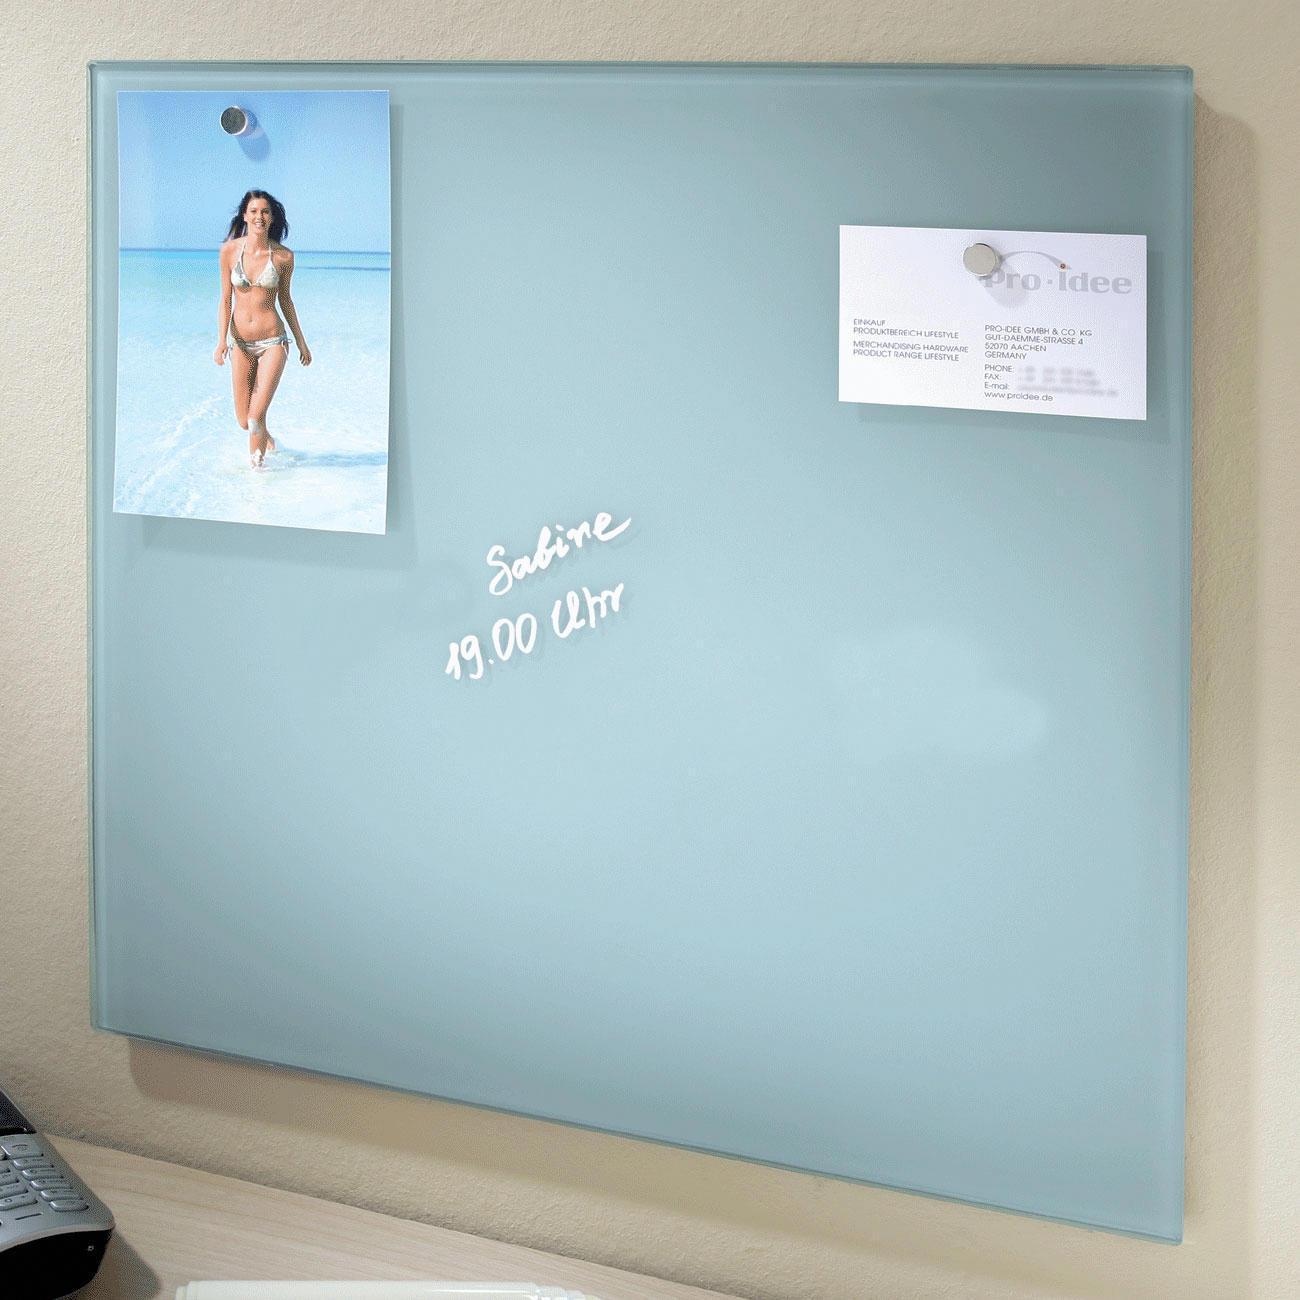 glas magnettafel 3 jahre garantie pro idee. Black Bedroom Furniture Sets. Home Design Ideas